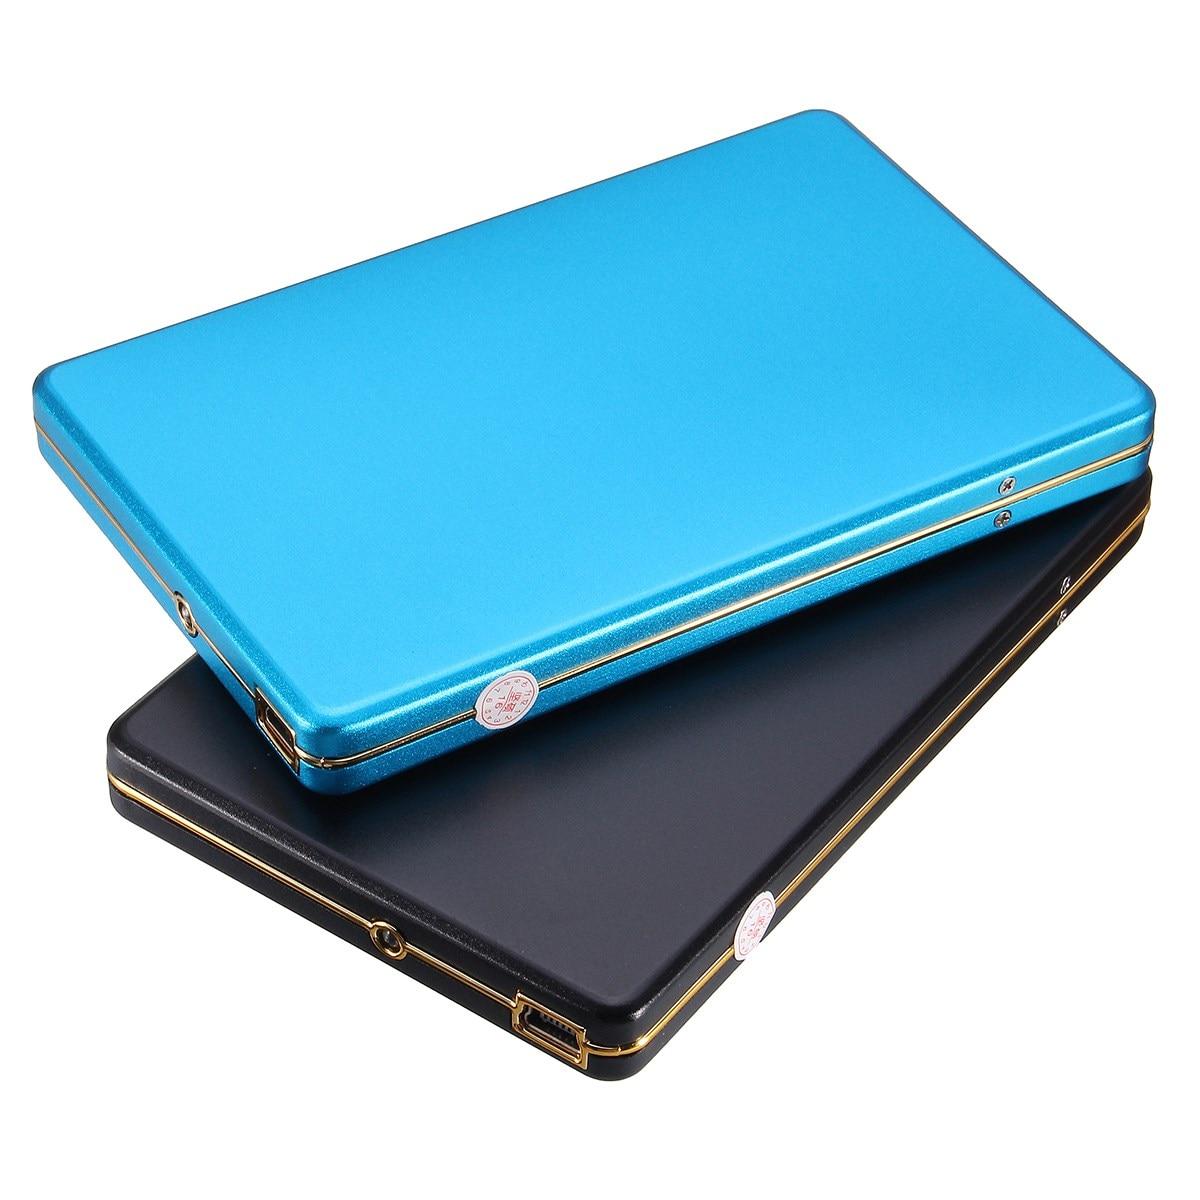 Portable External Hard Drive 500gb High Speed 2 5 Hard font b Disk b font for